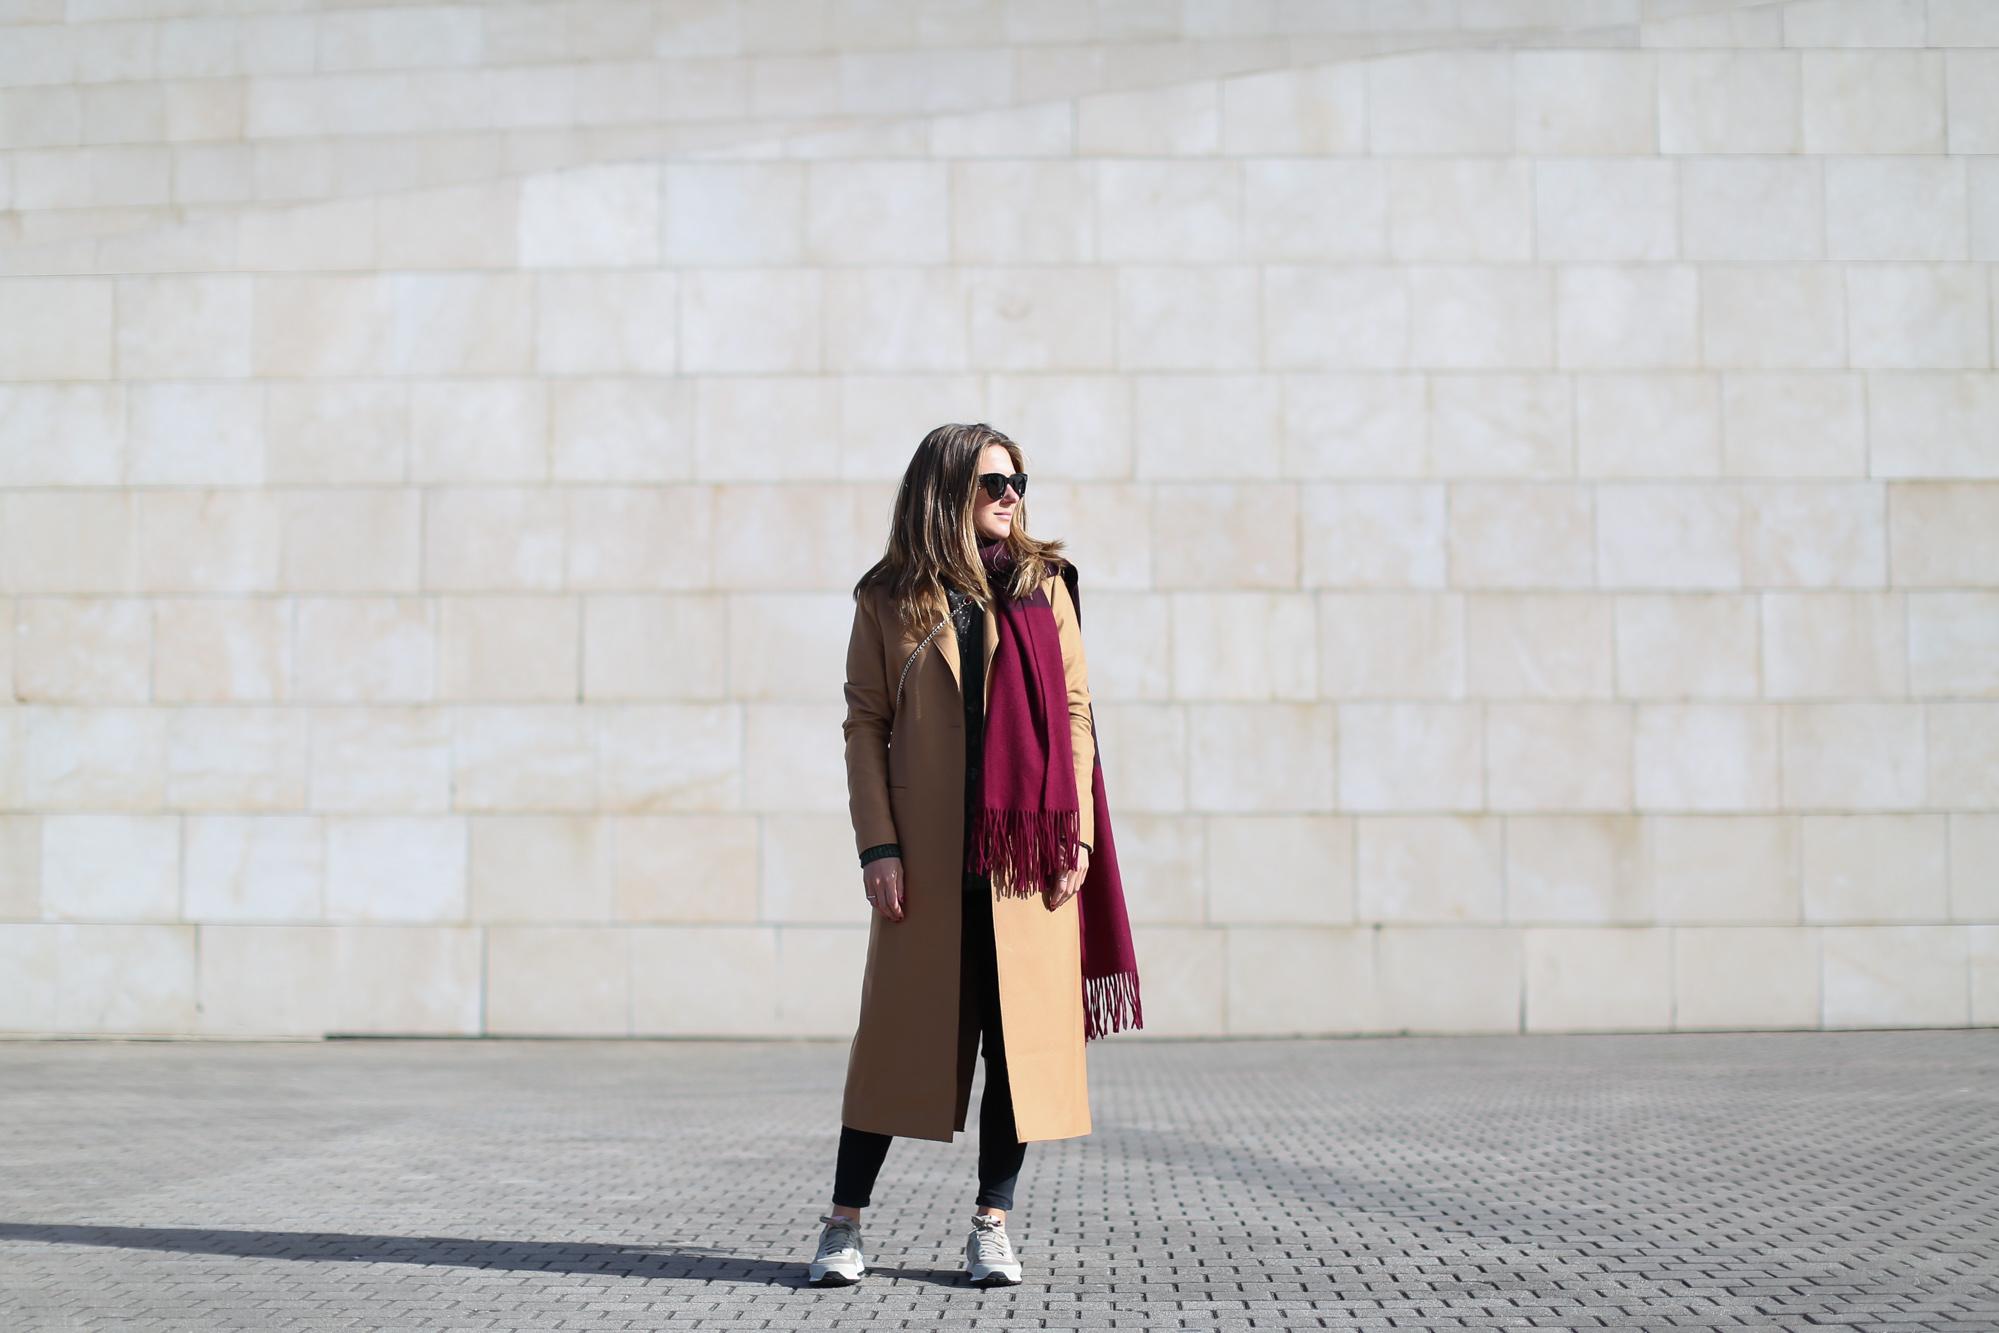 Clochet_streestyle_fashionblogger_&otherstories_abrigocamel_nikepegasus_topshopjamiejeans